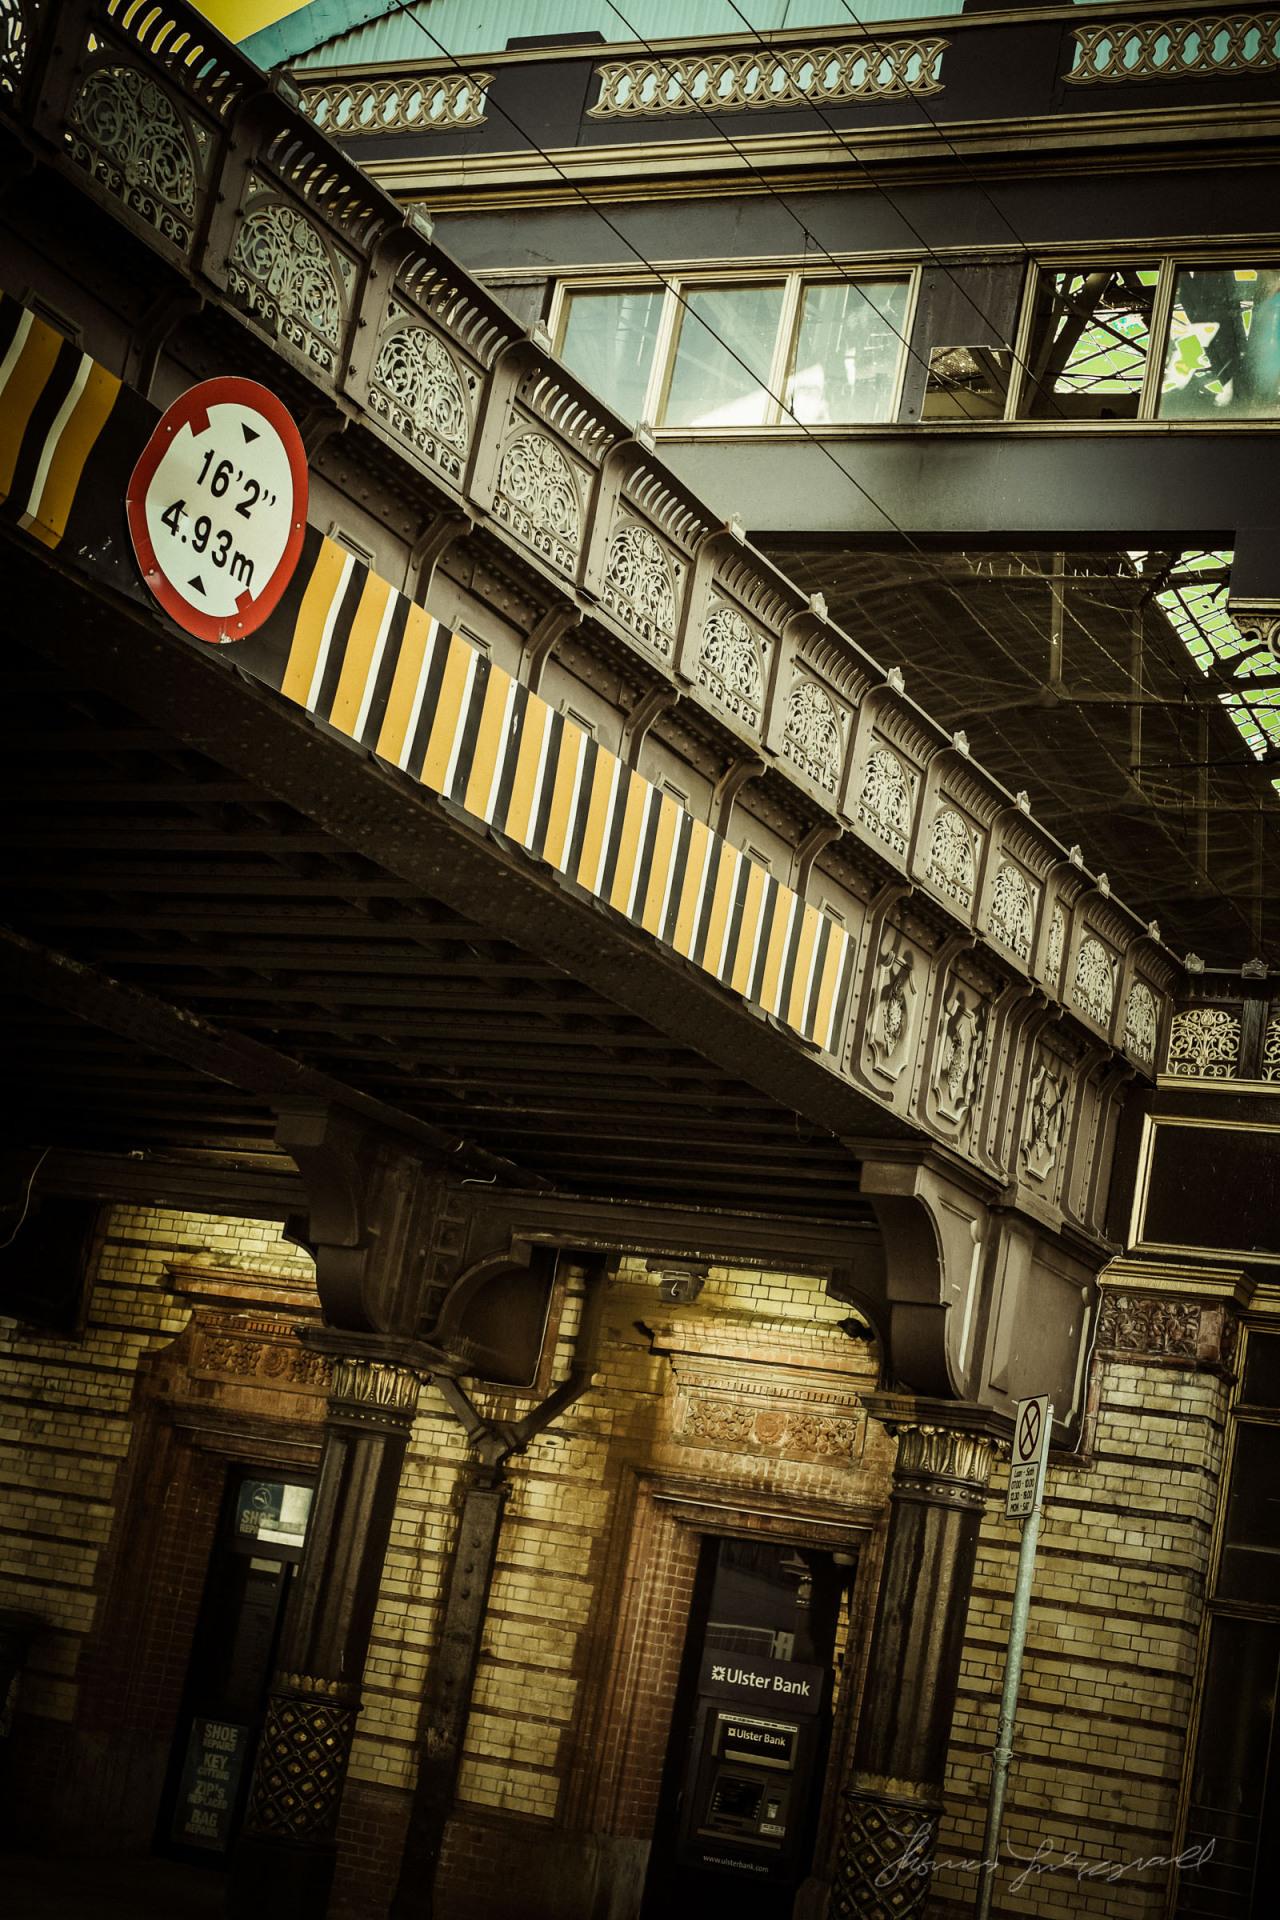 Westland Row train station